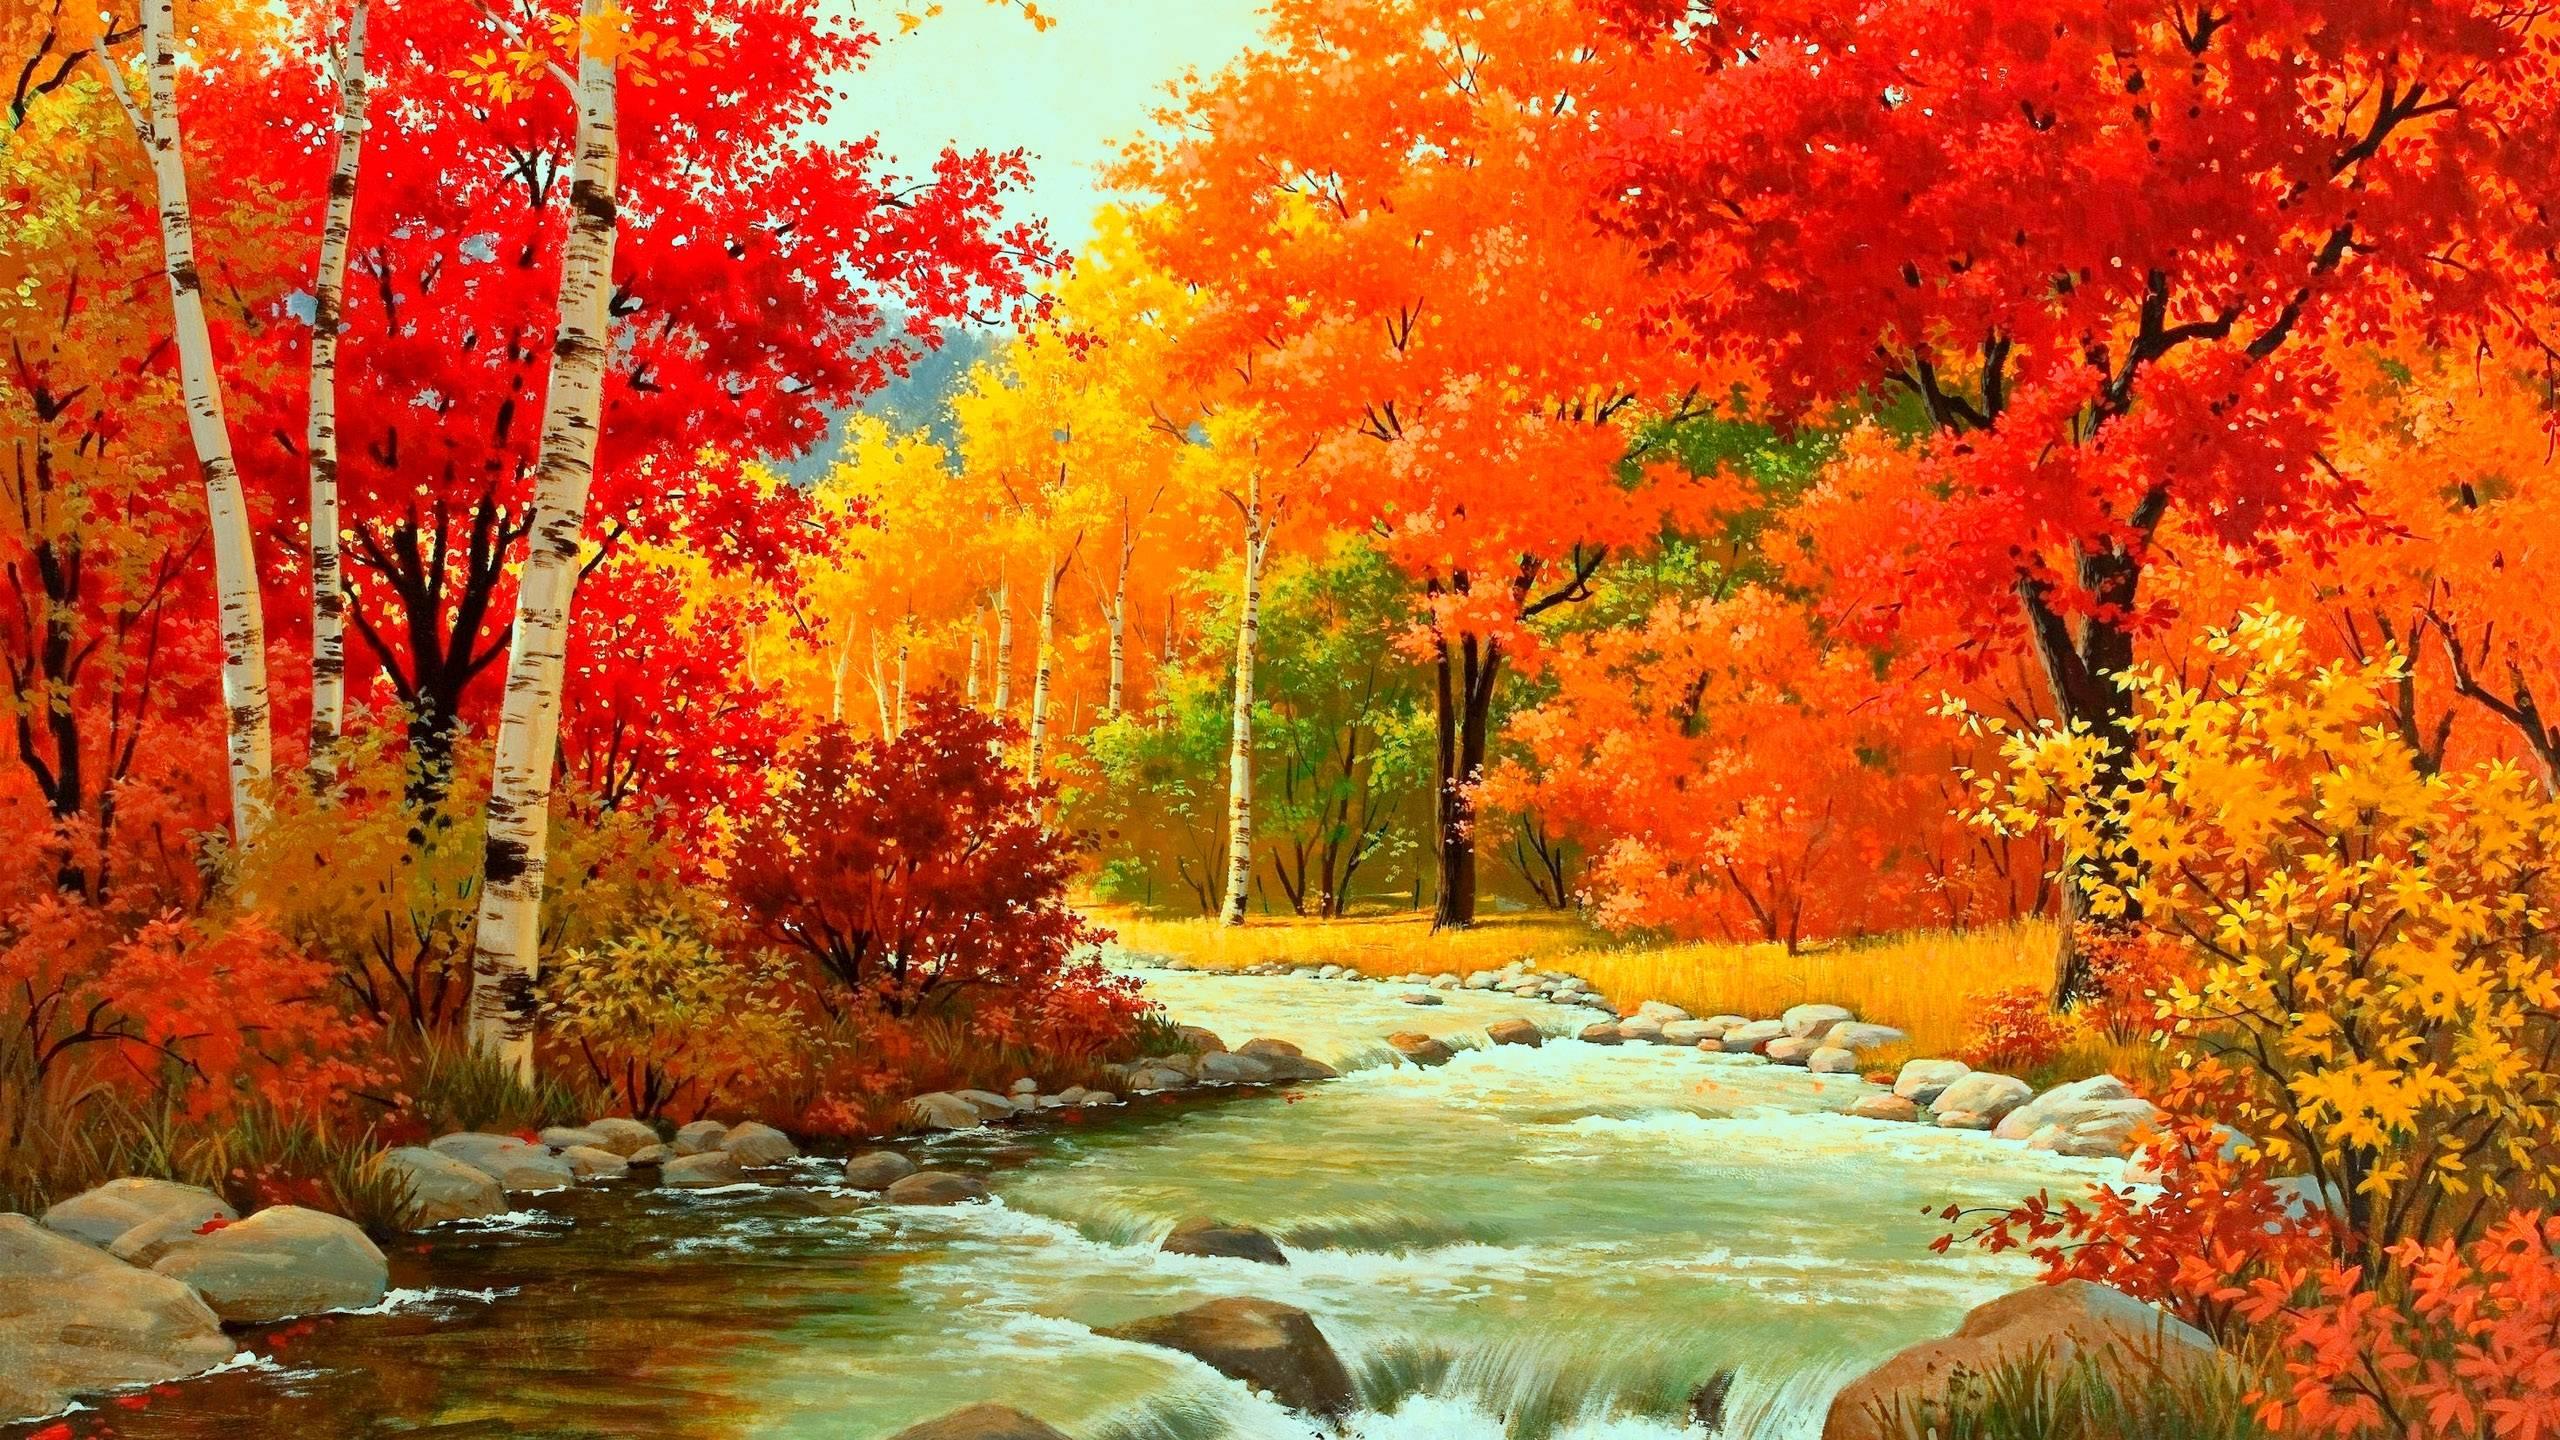 nature hd wallpaper for desktop